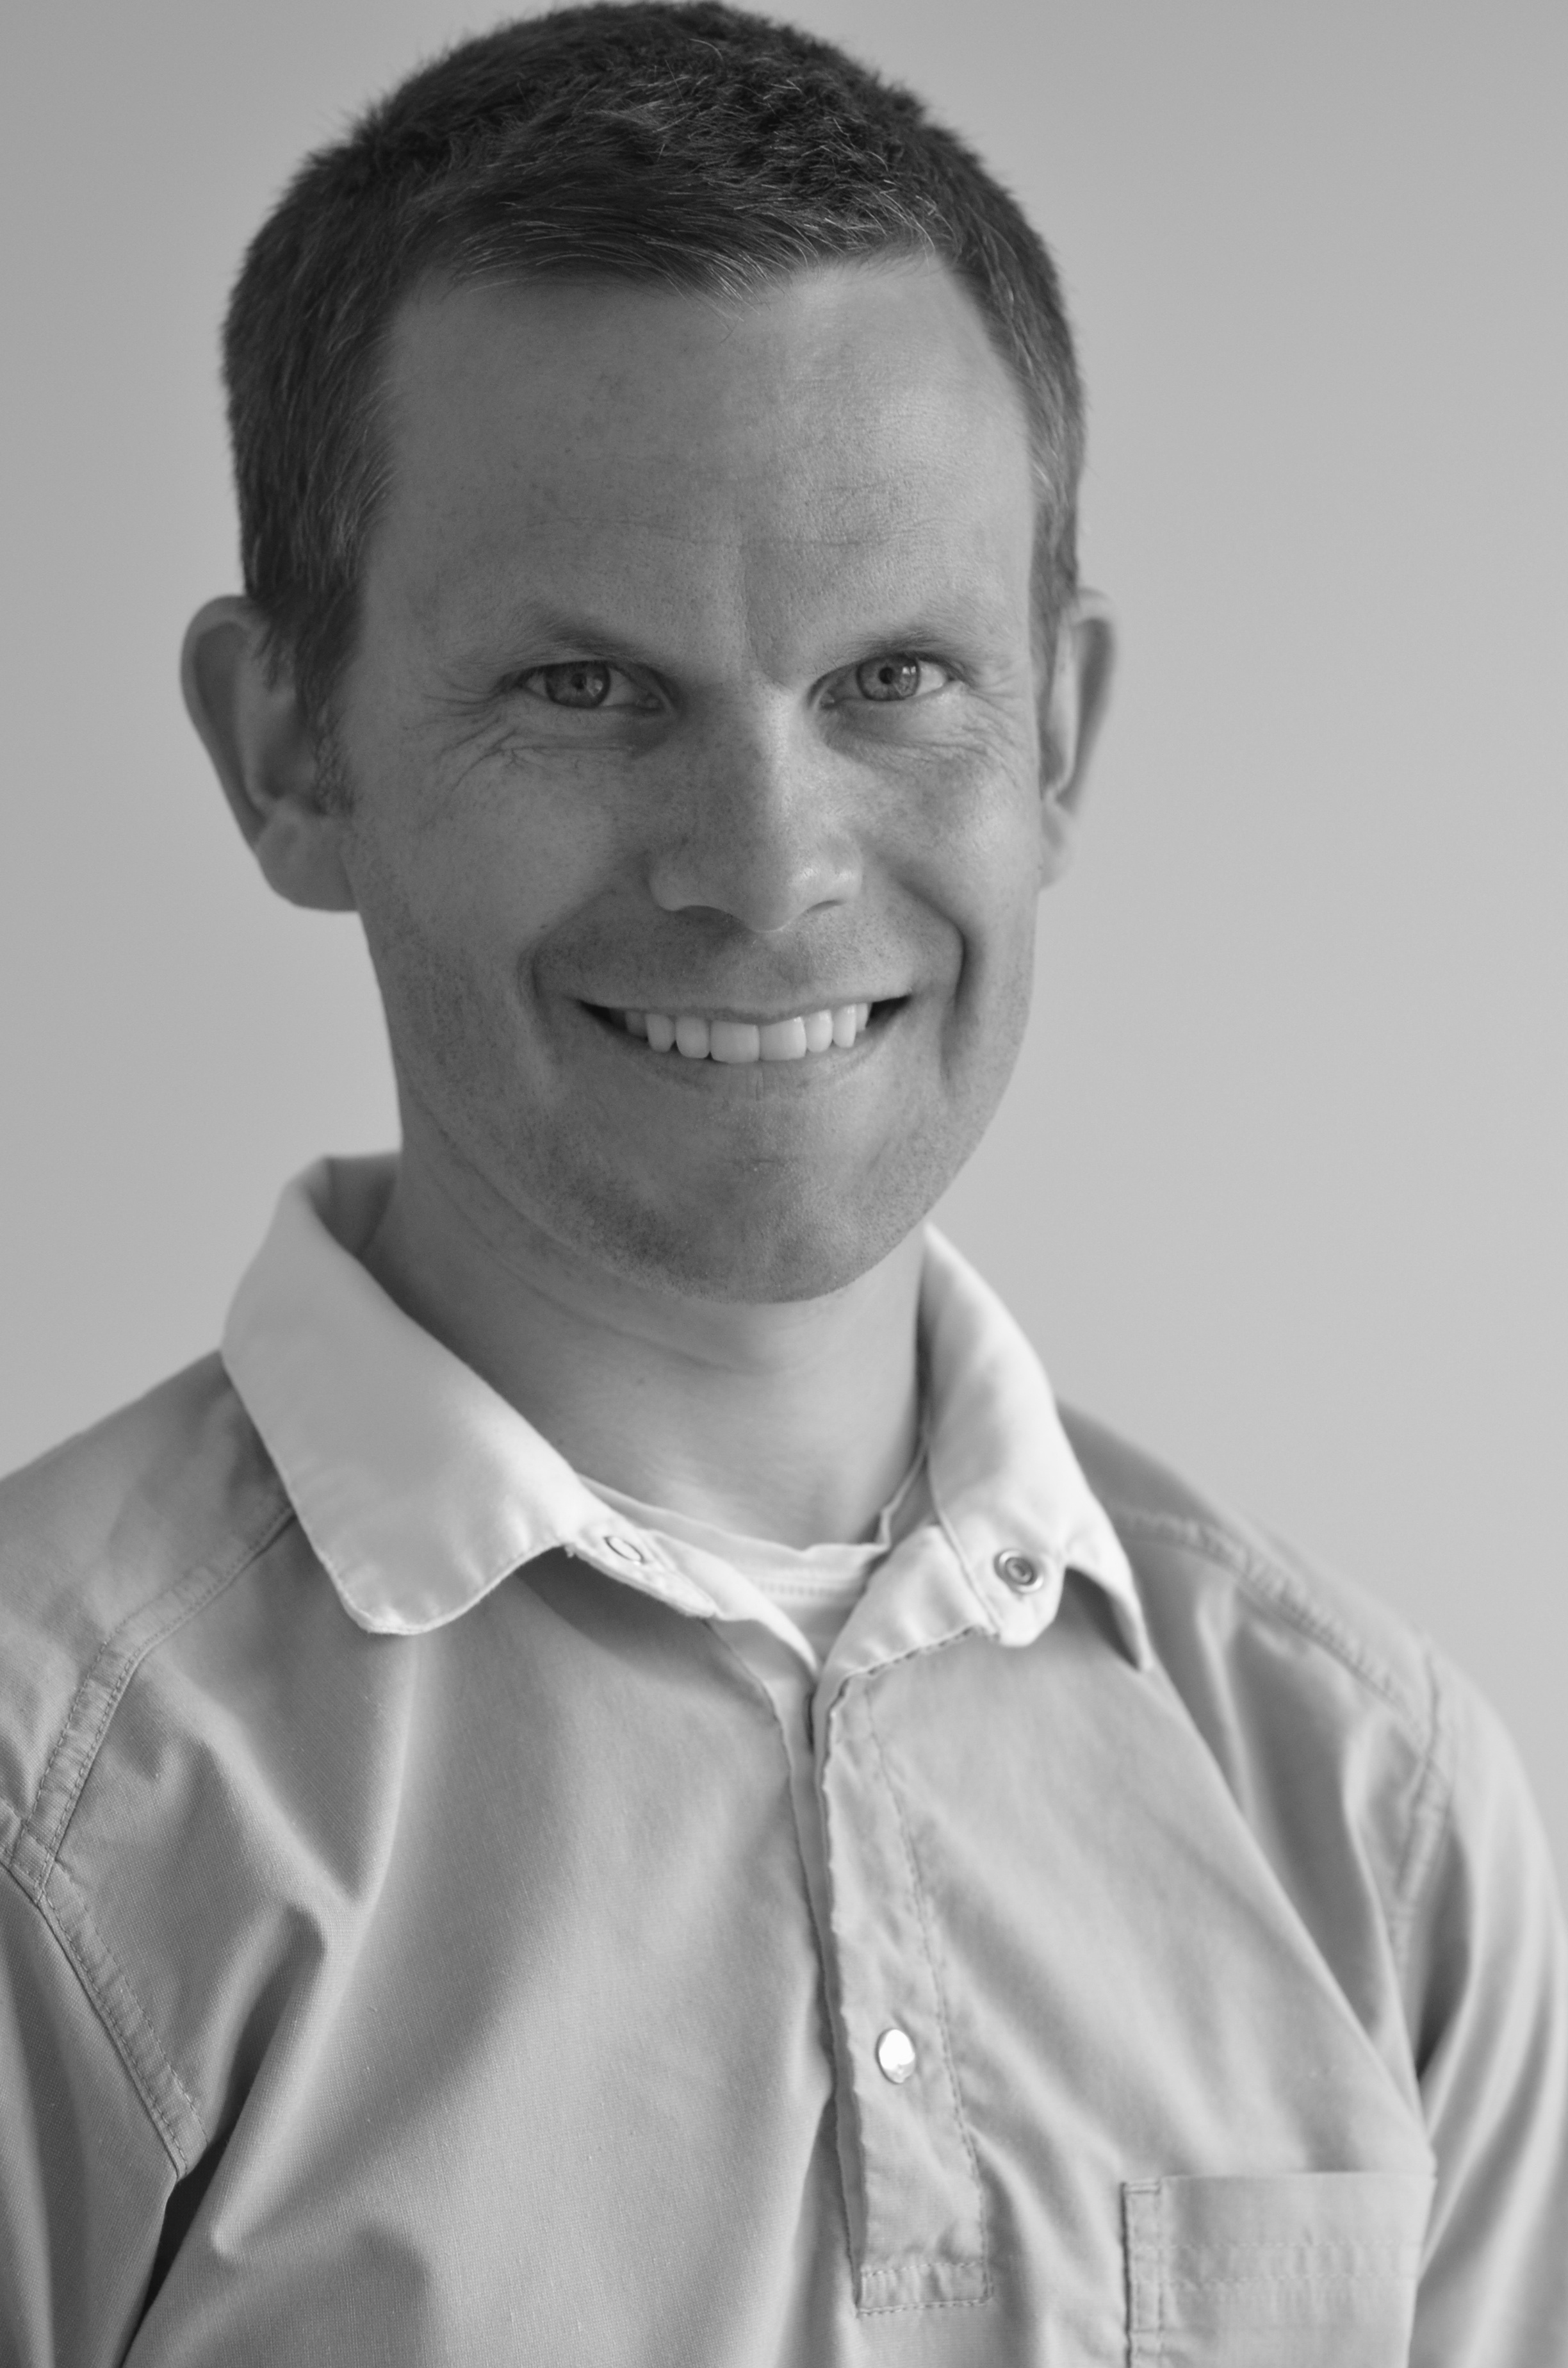 Einar Hals - Klinikkeier og tannlege MNTFUtdannet ved Universitetet i Bergen ved det medisinsk-odontologiske faktuelt 2003-2008.Einar er fra Elnesvågen